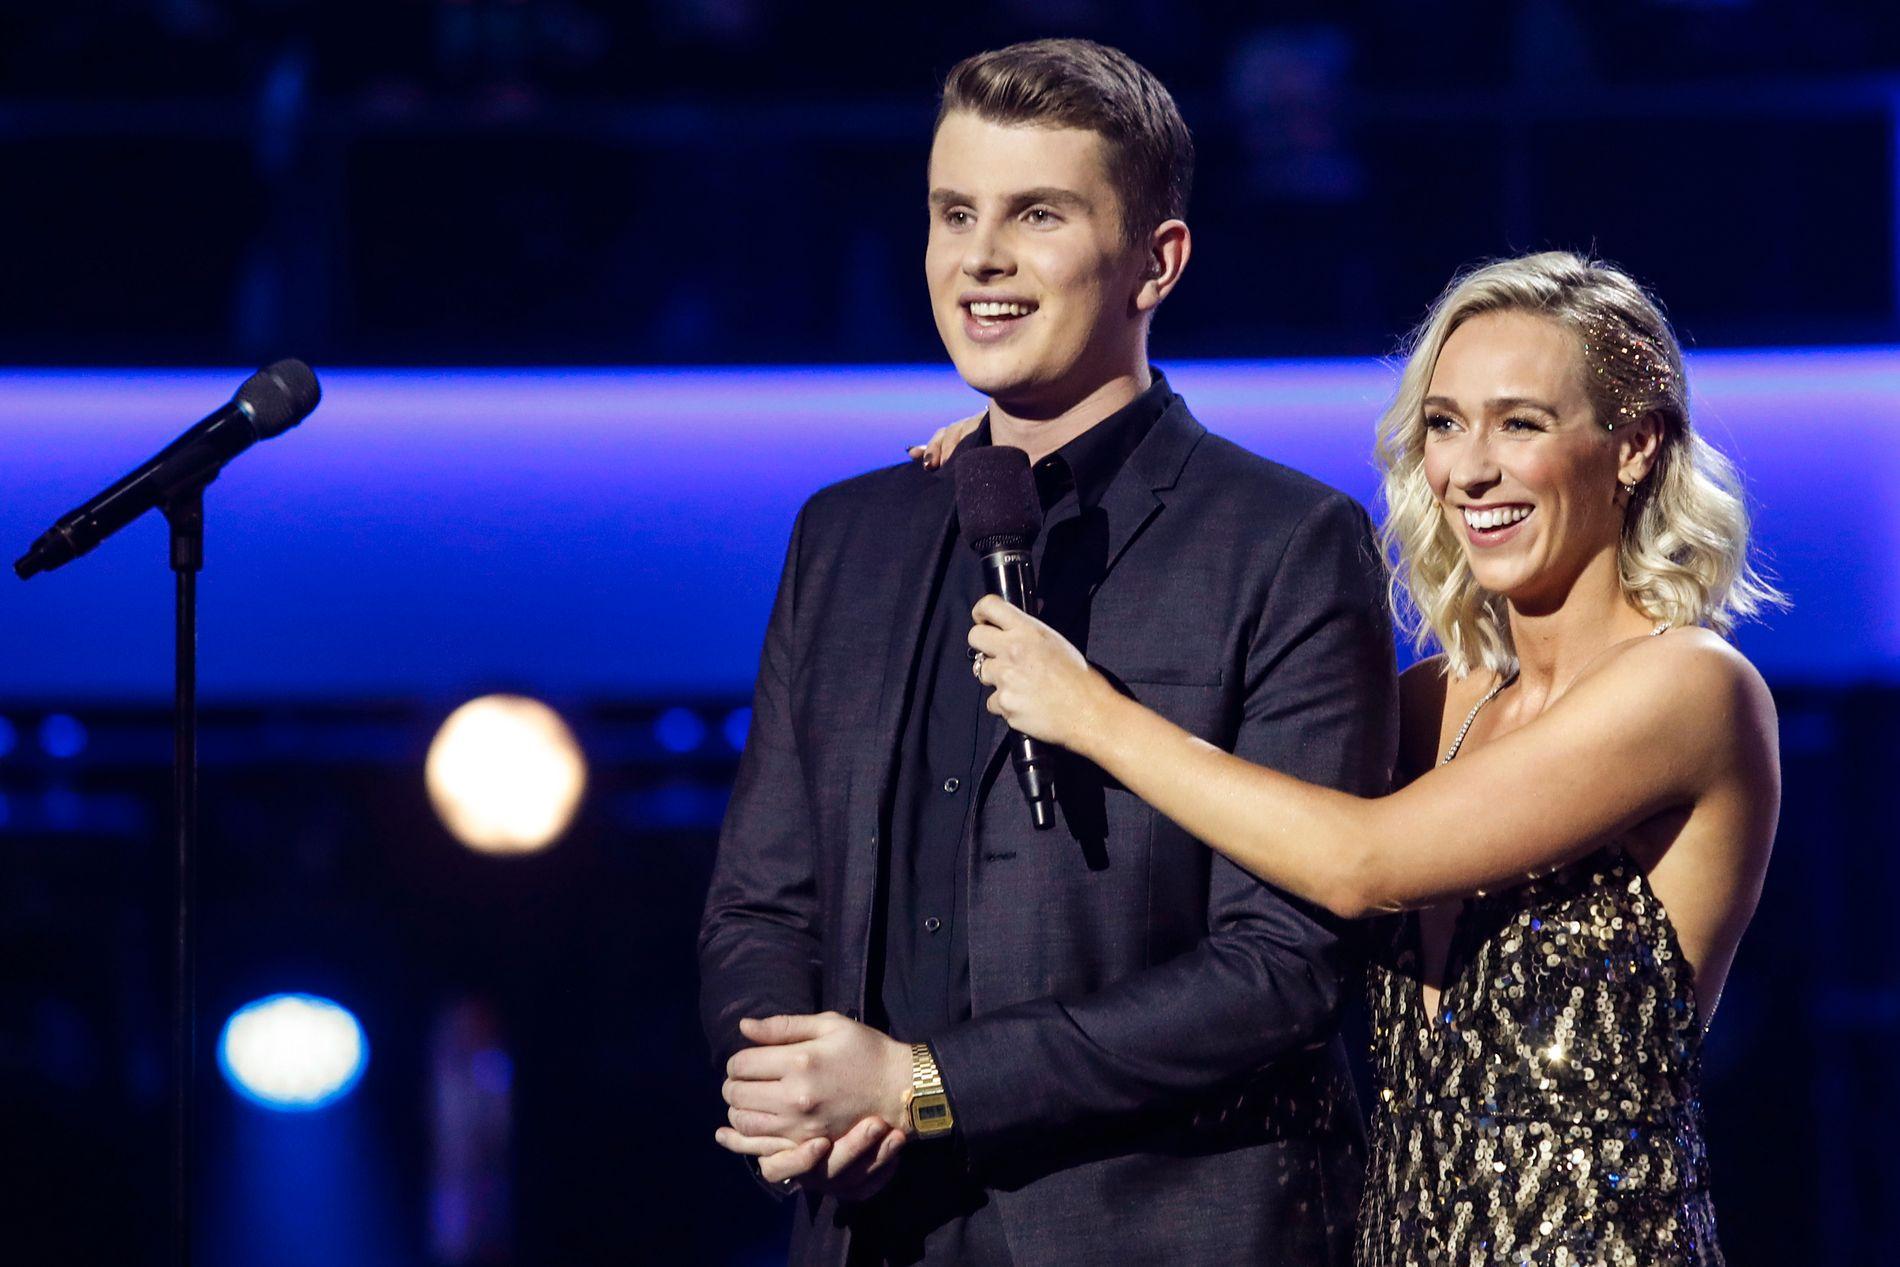 Idol-vinner Øystein Hegvik sammen med programleder Katarina Flatland under finalen i Idol på TV 2 lørdag kveld. Foto: Terje Bendiksby / NTB scanpix